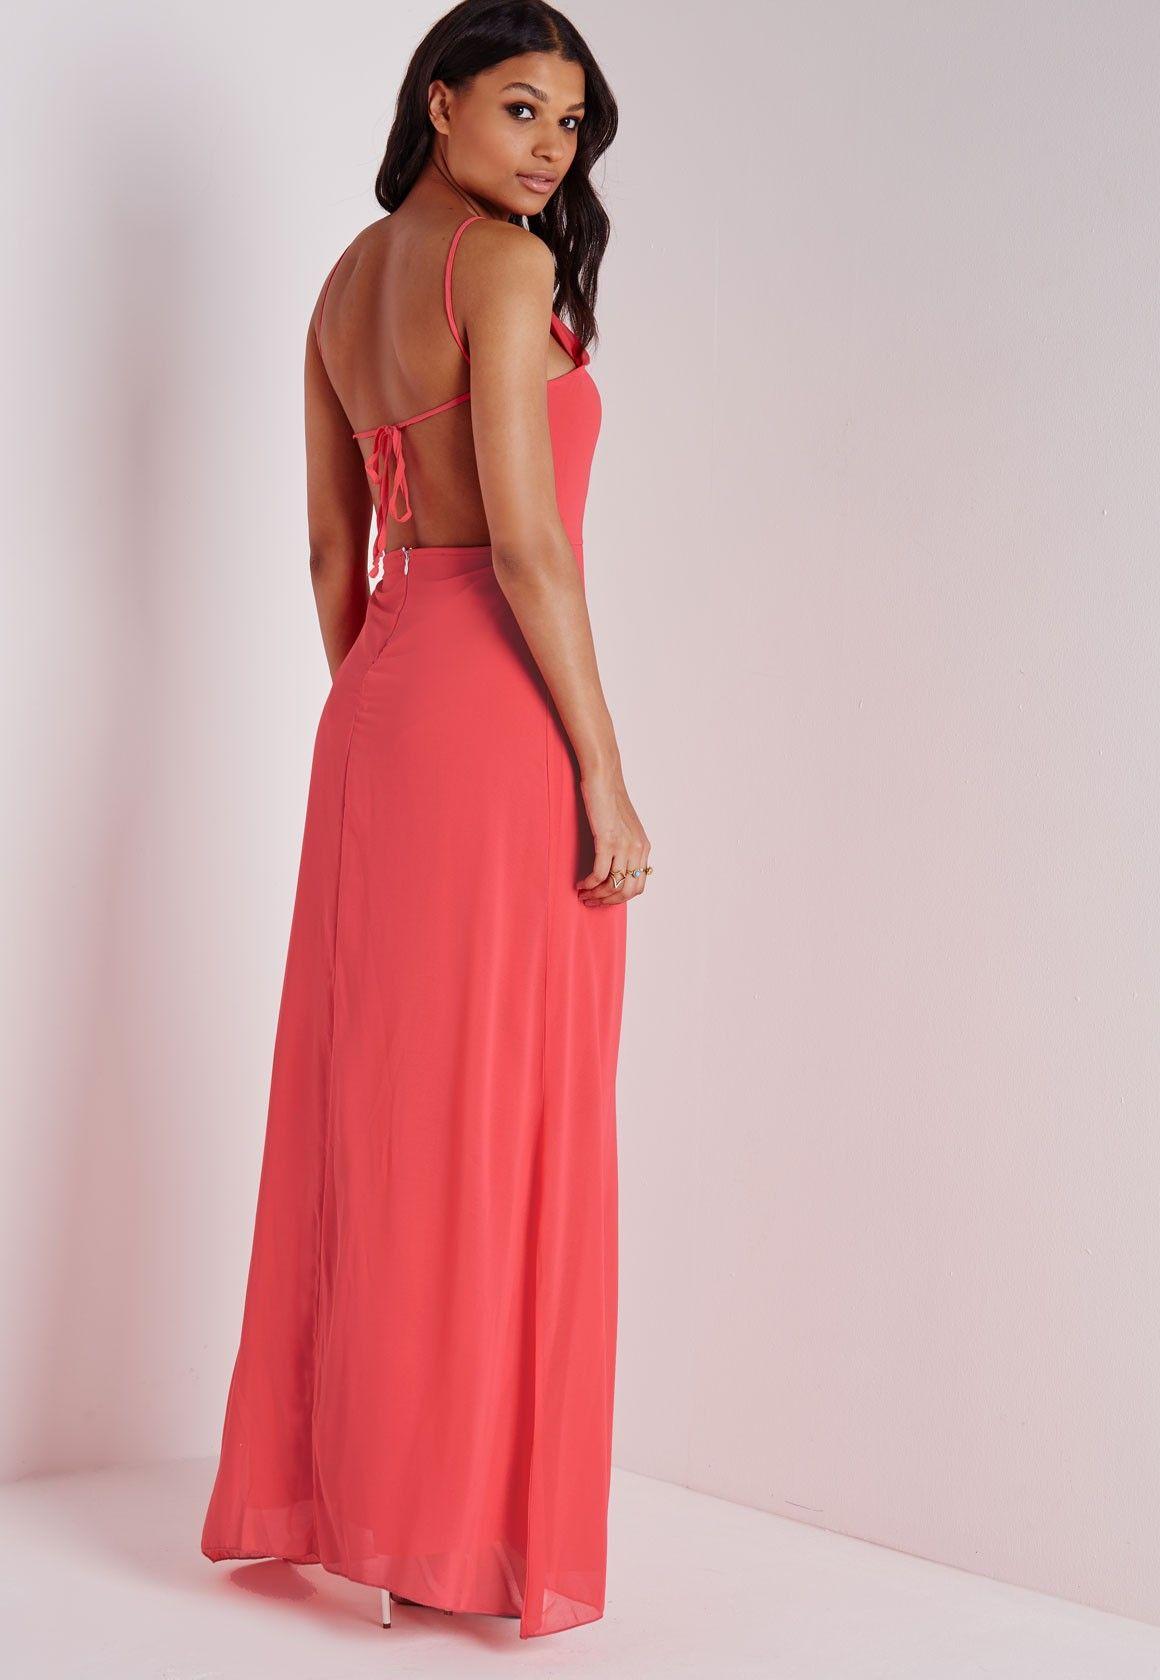 Missguided - Robe longue rose corail dos nu à bretelles fines ... 78fca72c8bb1